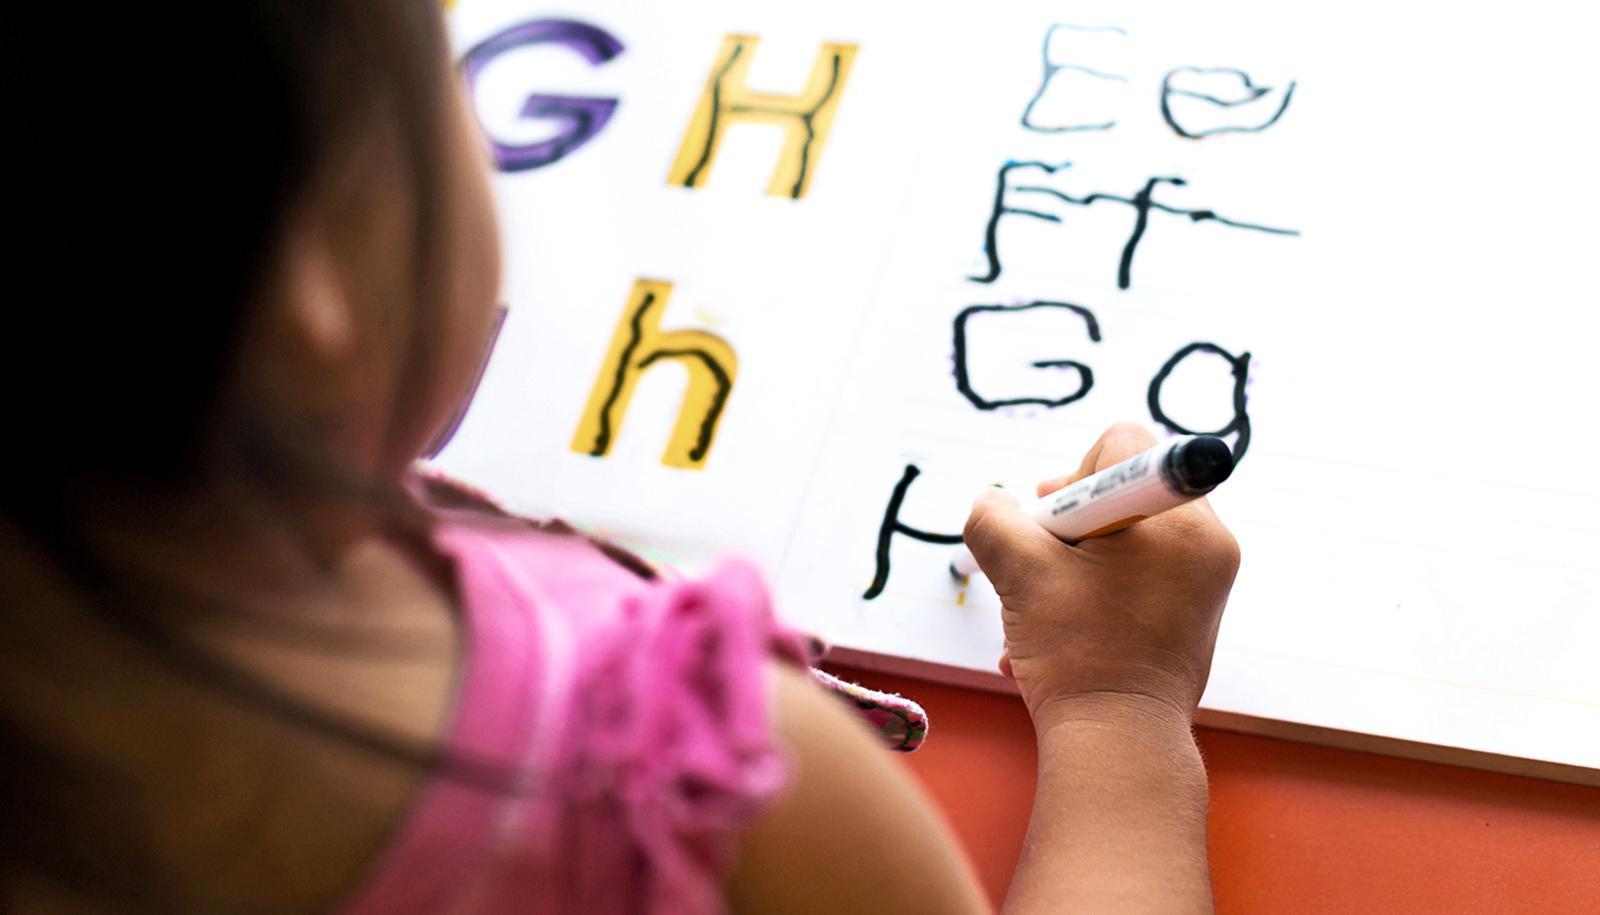 A preschool girl is writing letters in a workbook